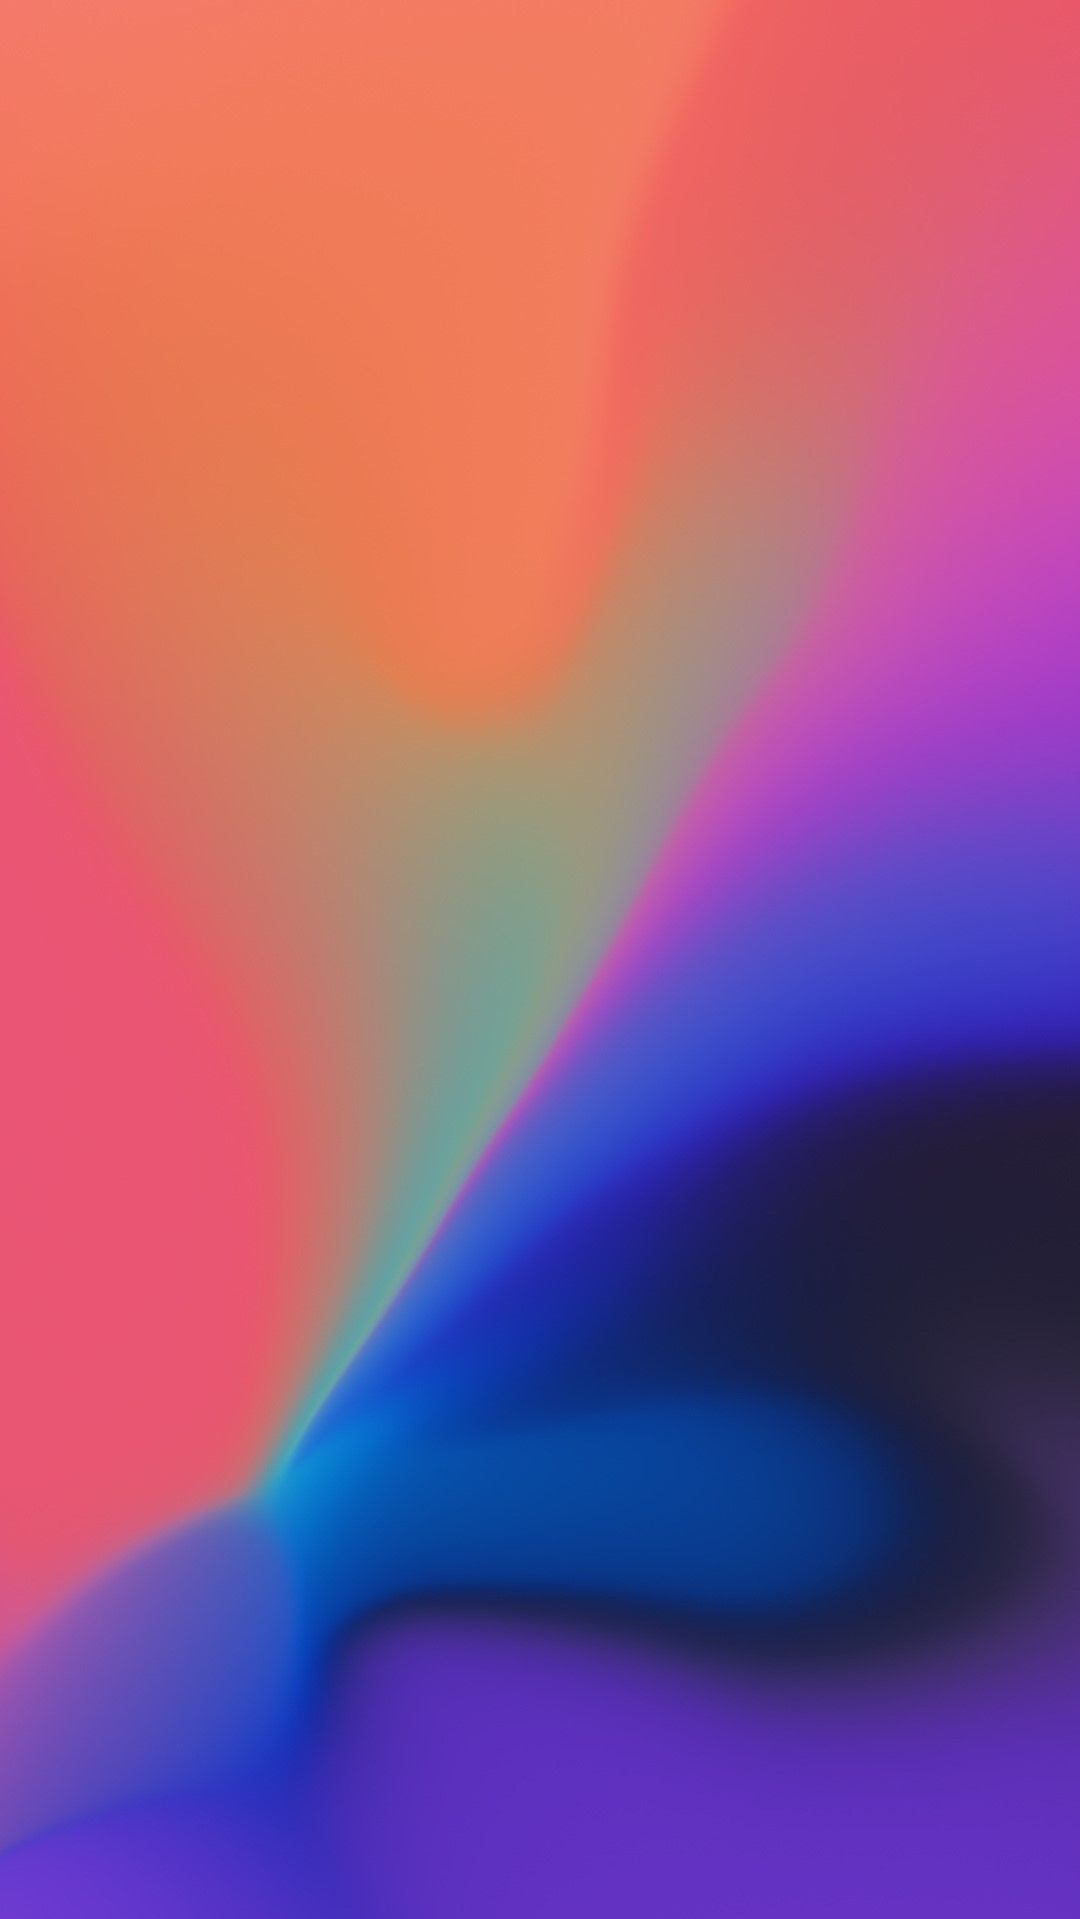 Abstract Iphone Wallpaper Abstract Iphone Wallpaper Ombre Wallpapers Ombre Wallpaper Iphone